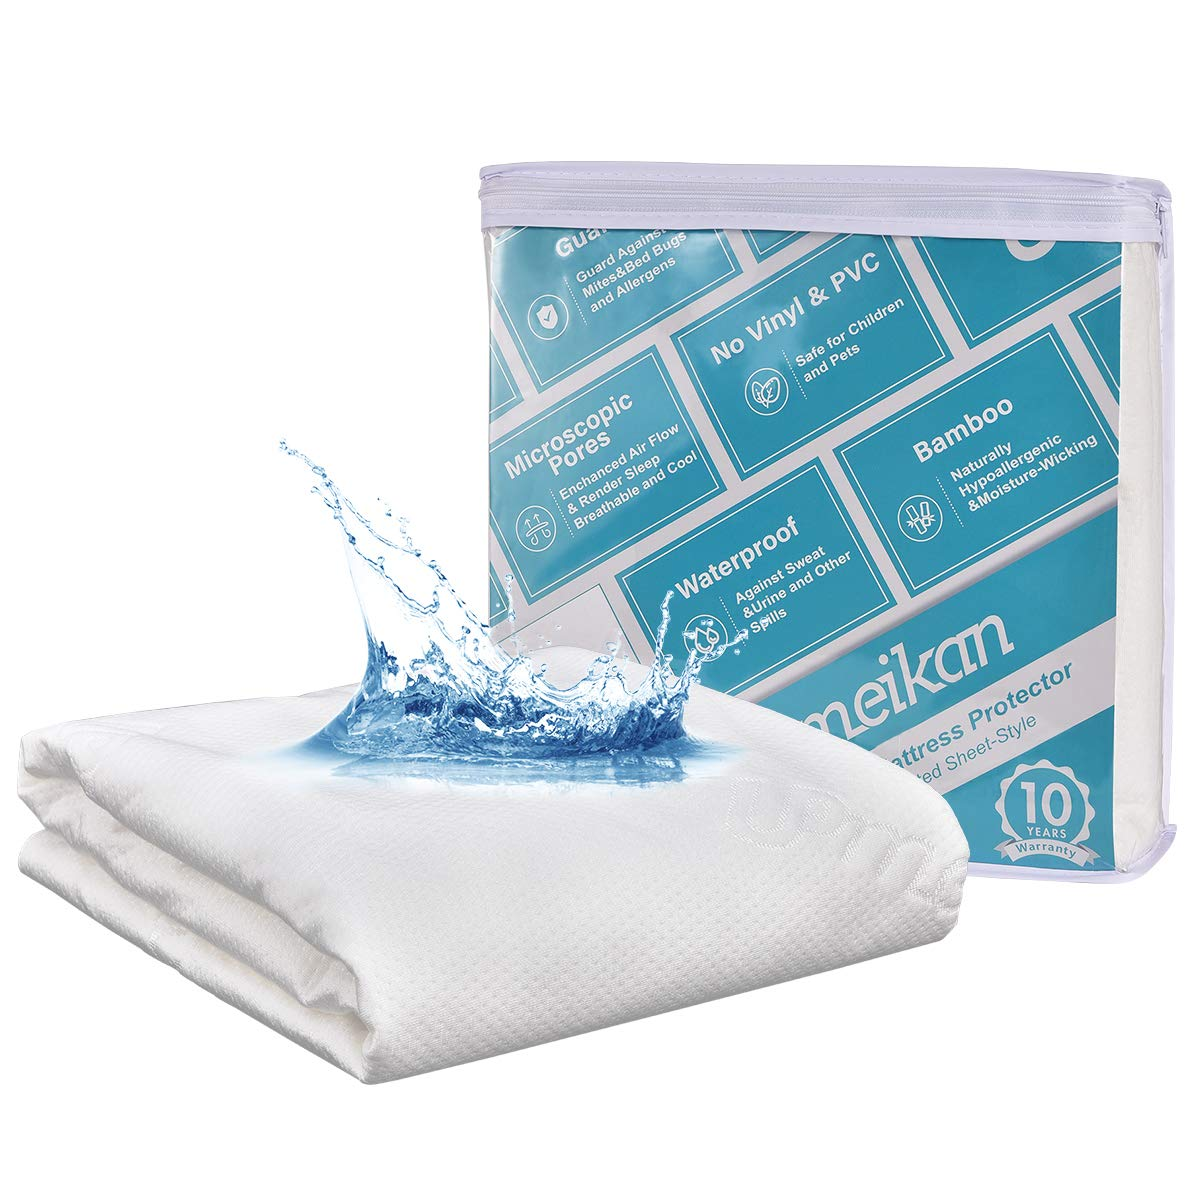 upmeikan Protector Premium Hypoallergenic Microscopic Pores Vinyl